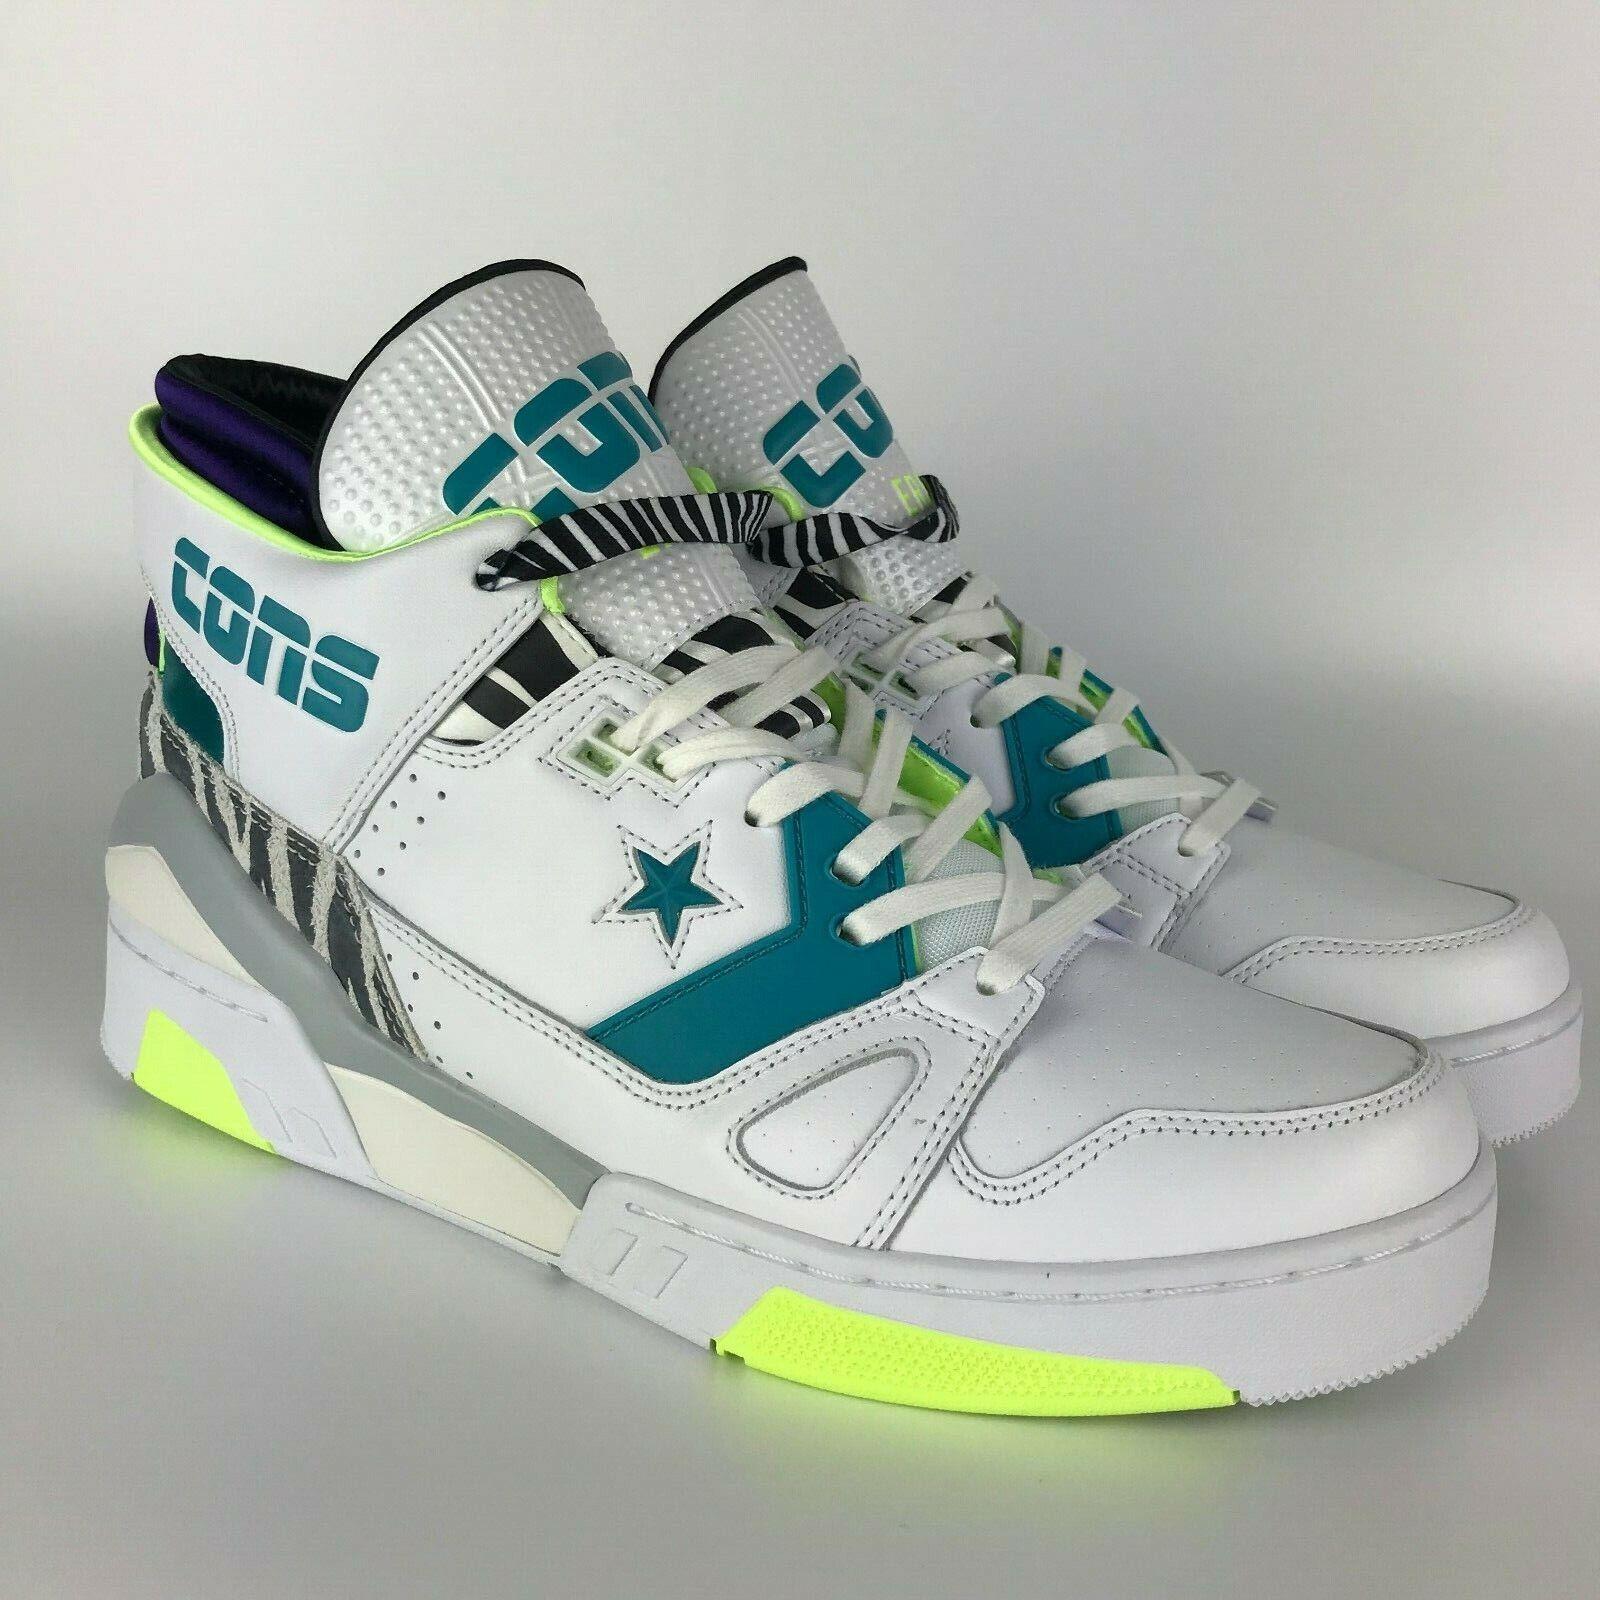 Converse ERX 260 Mid Just Animal Pack 163783C zapatos Talla